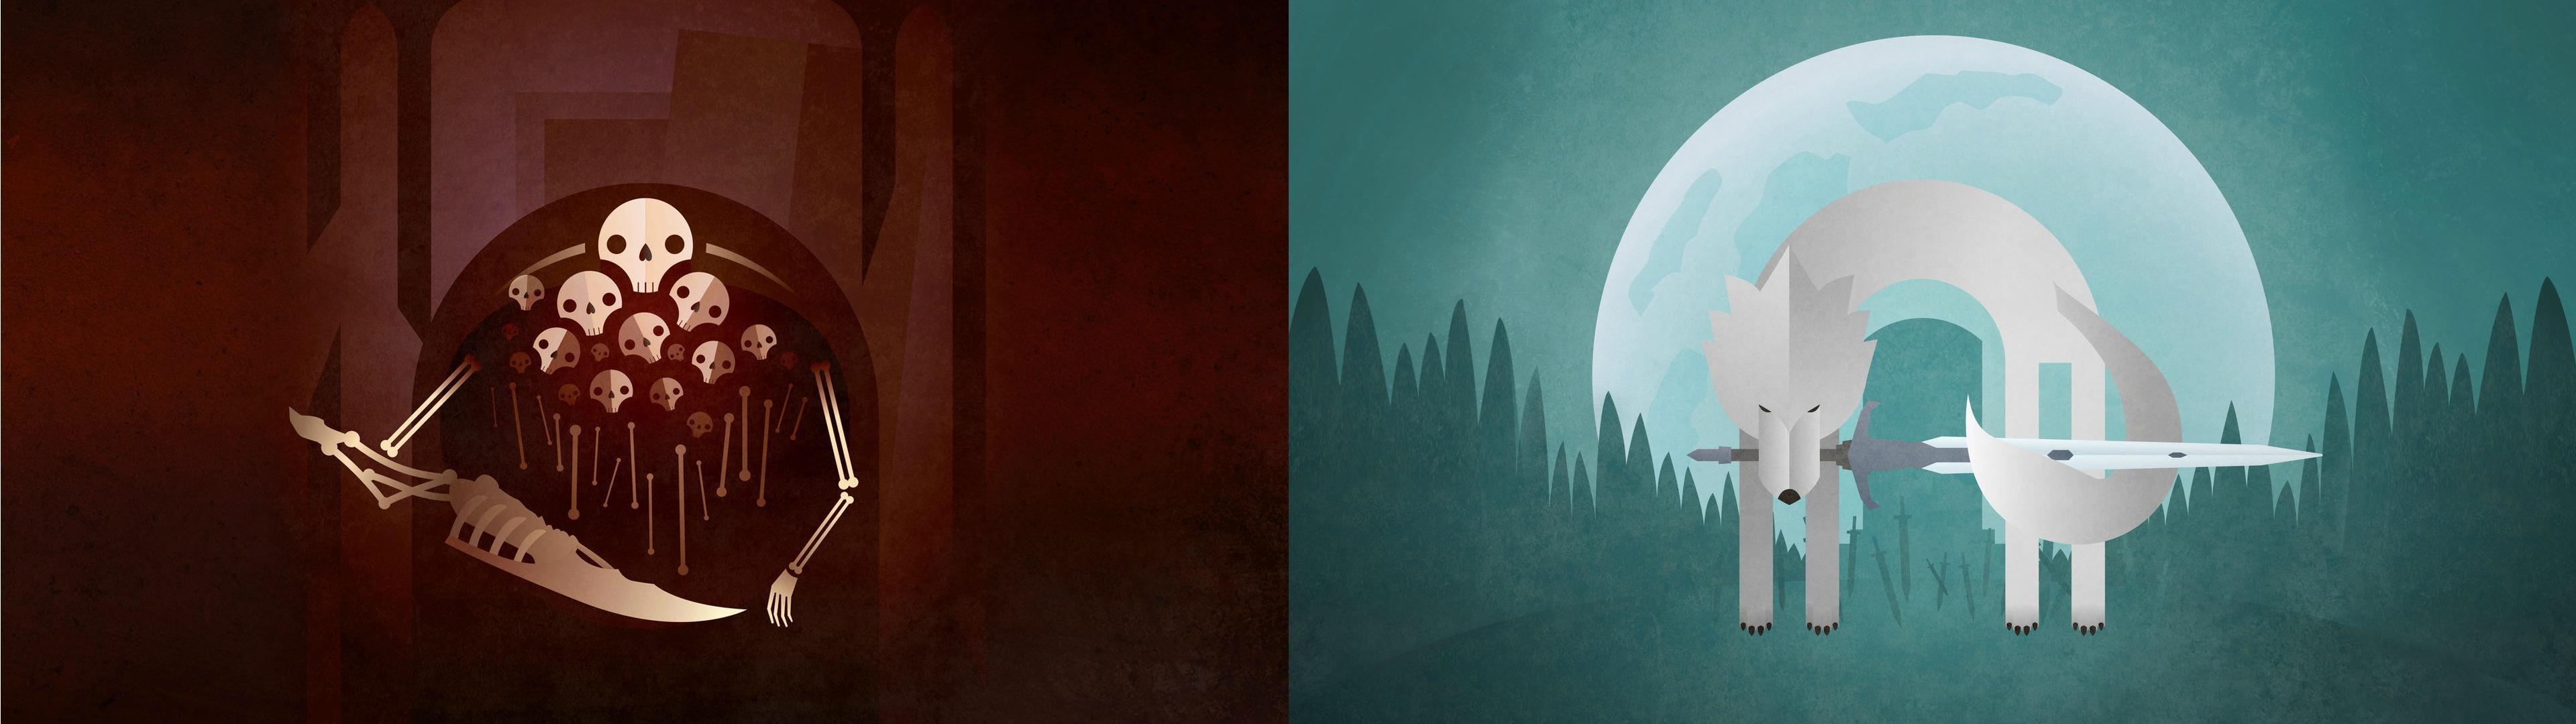 Lemme See Your Best Dark Souls Wallpapers Darksouls3